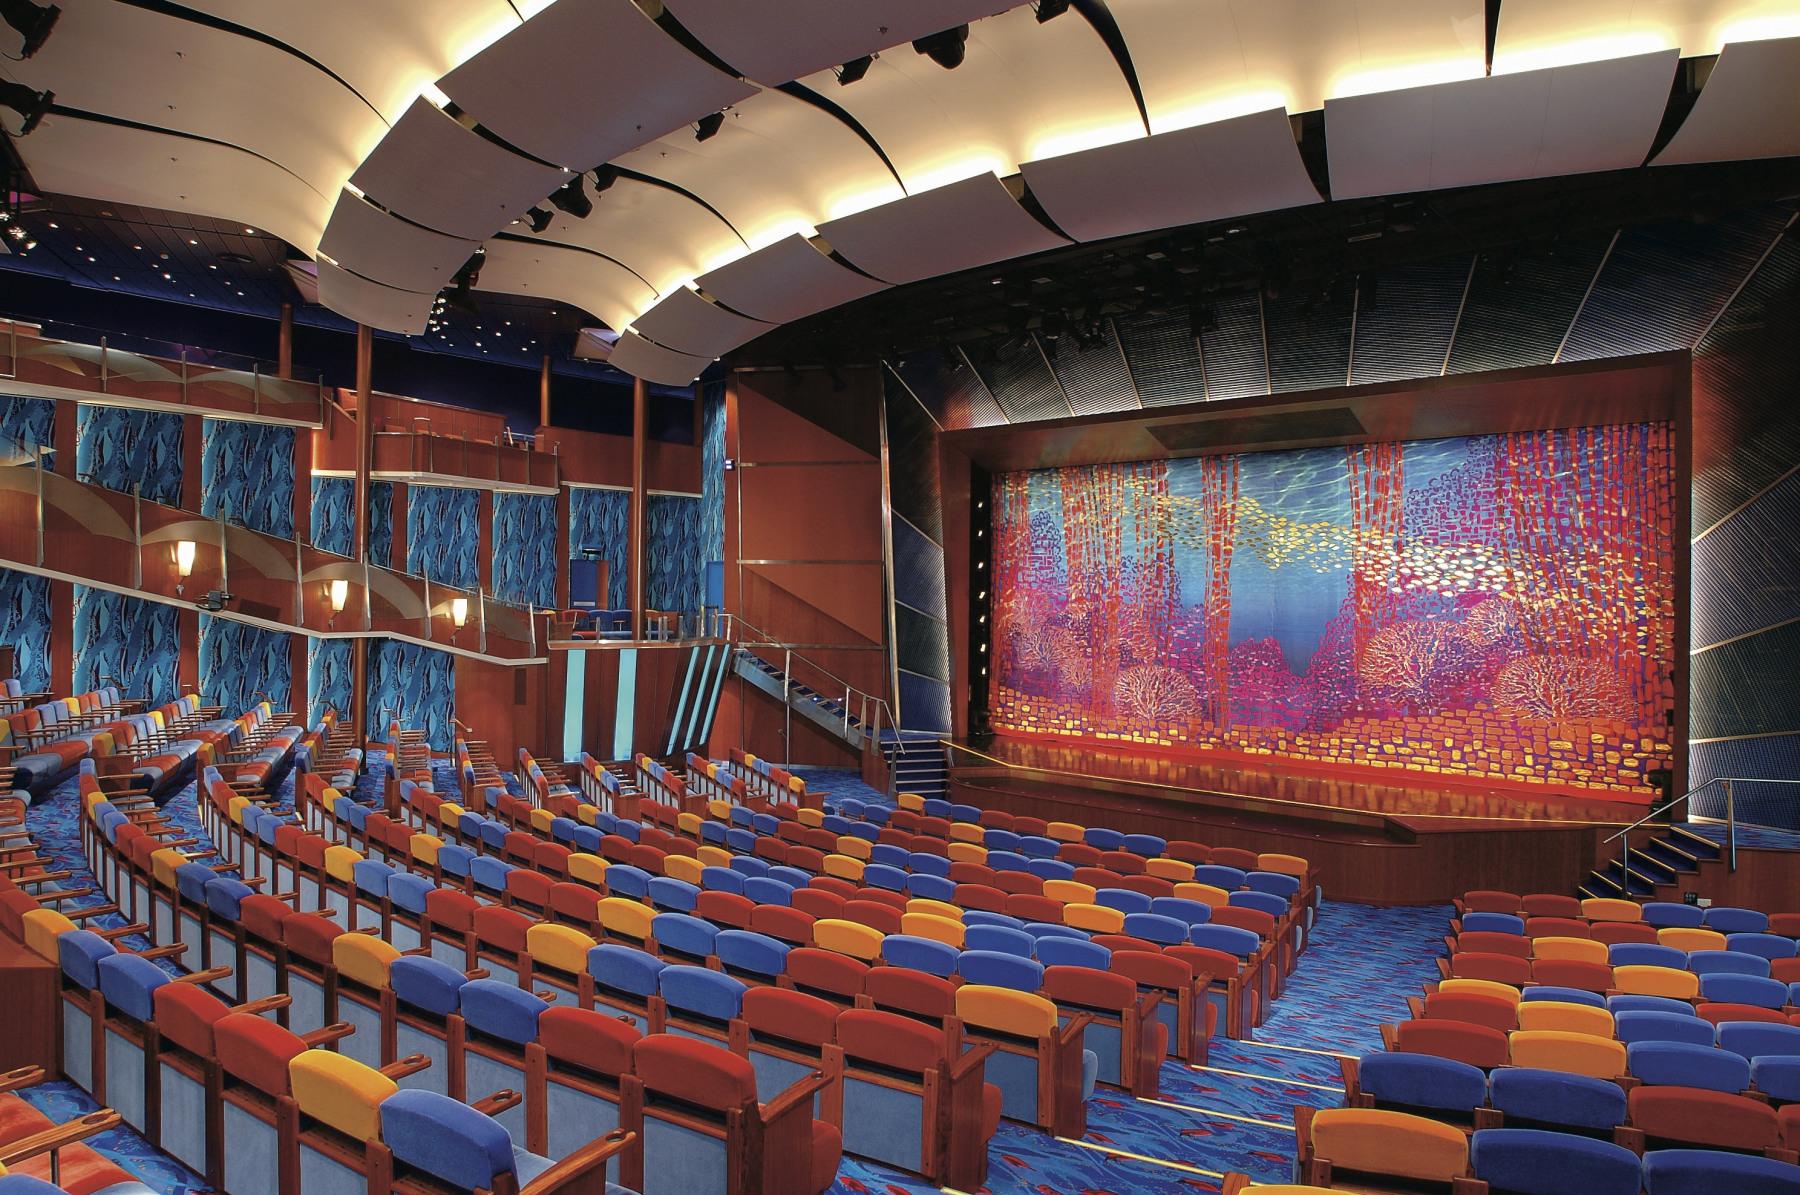 Royal Caribbean International Jewel of the Seas Interior Coral Theater.jpeg